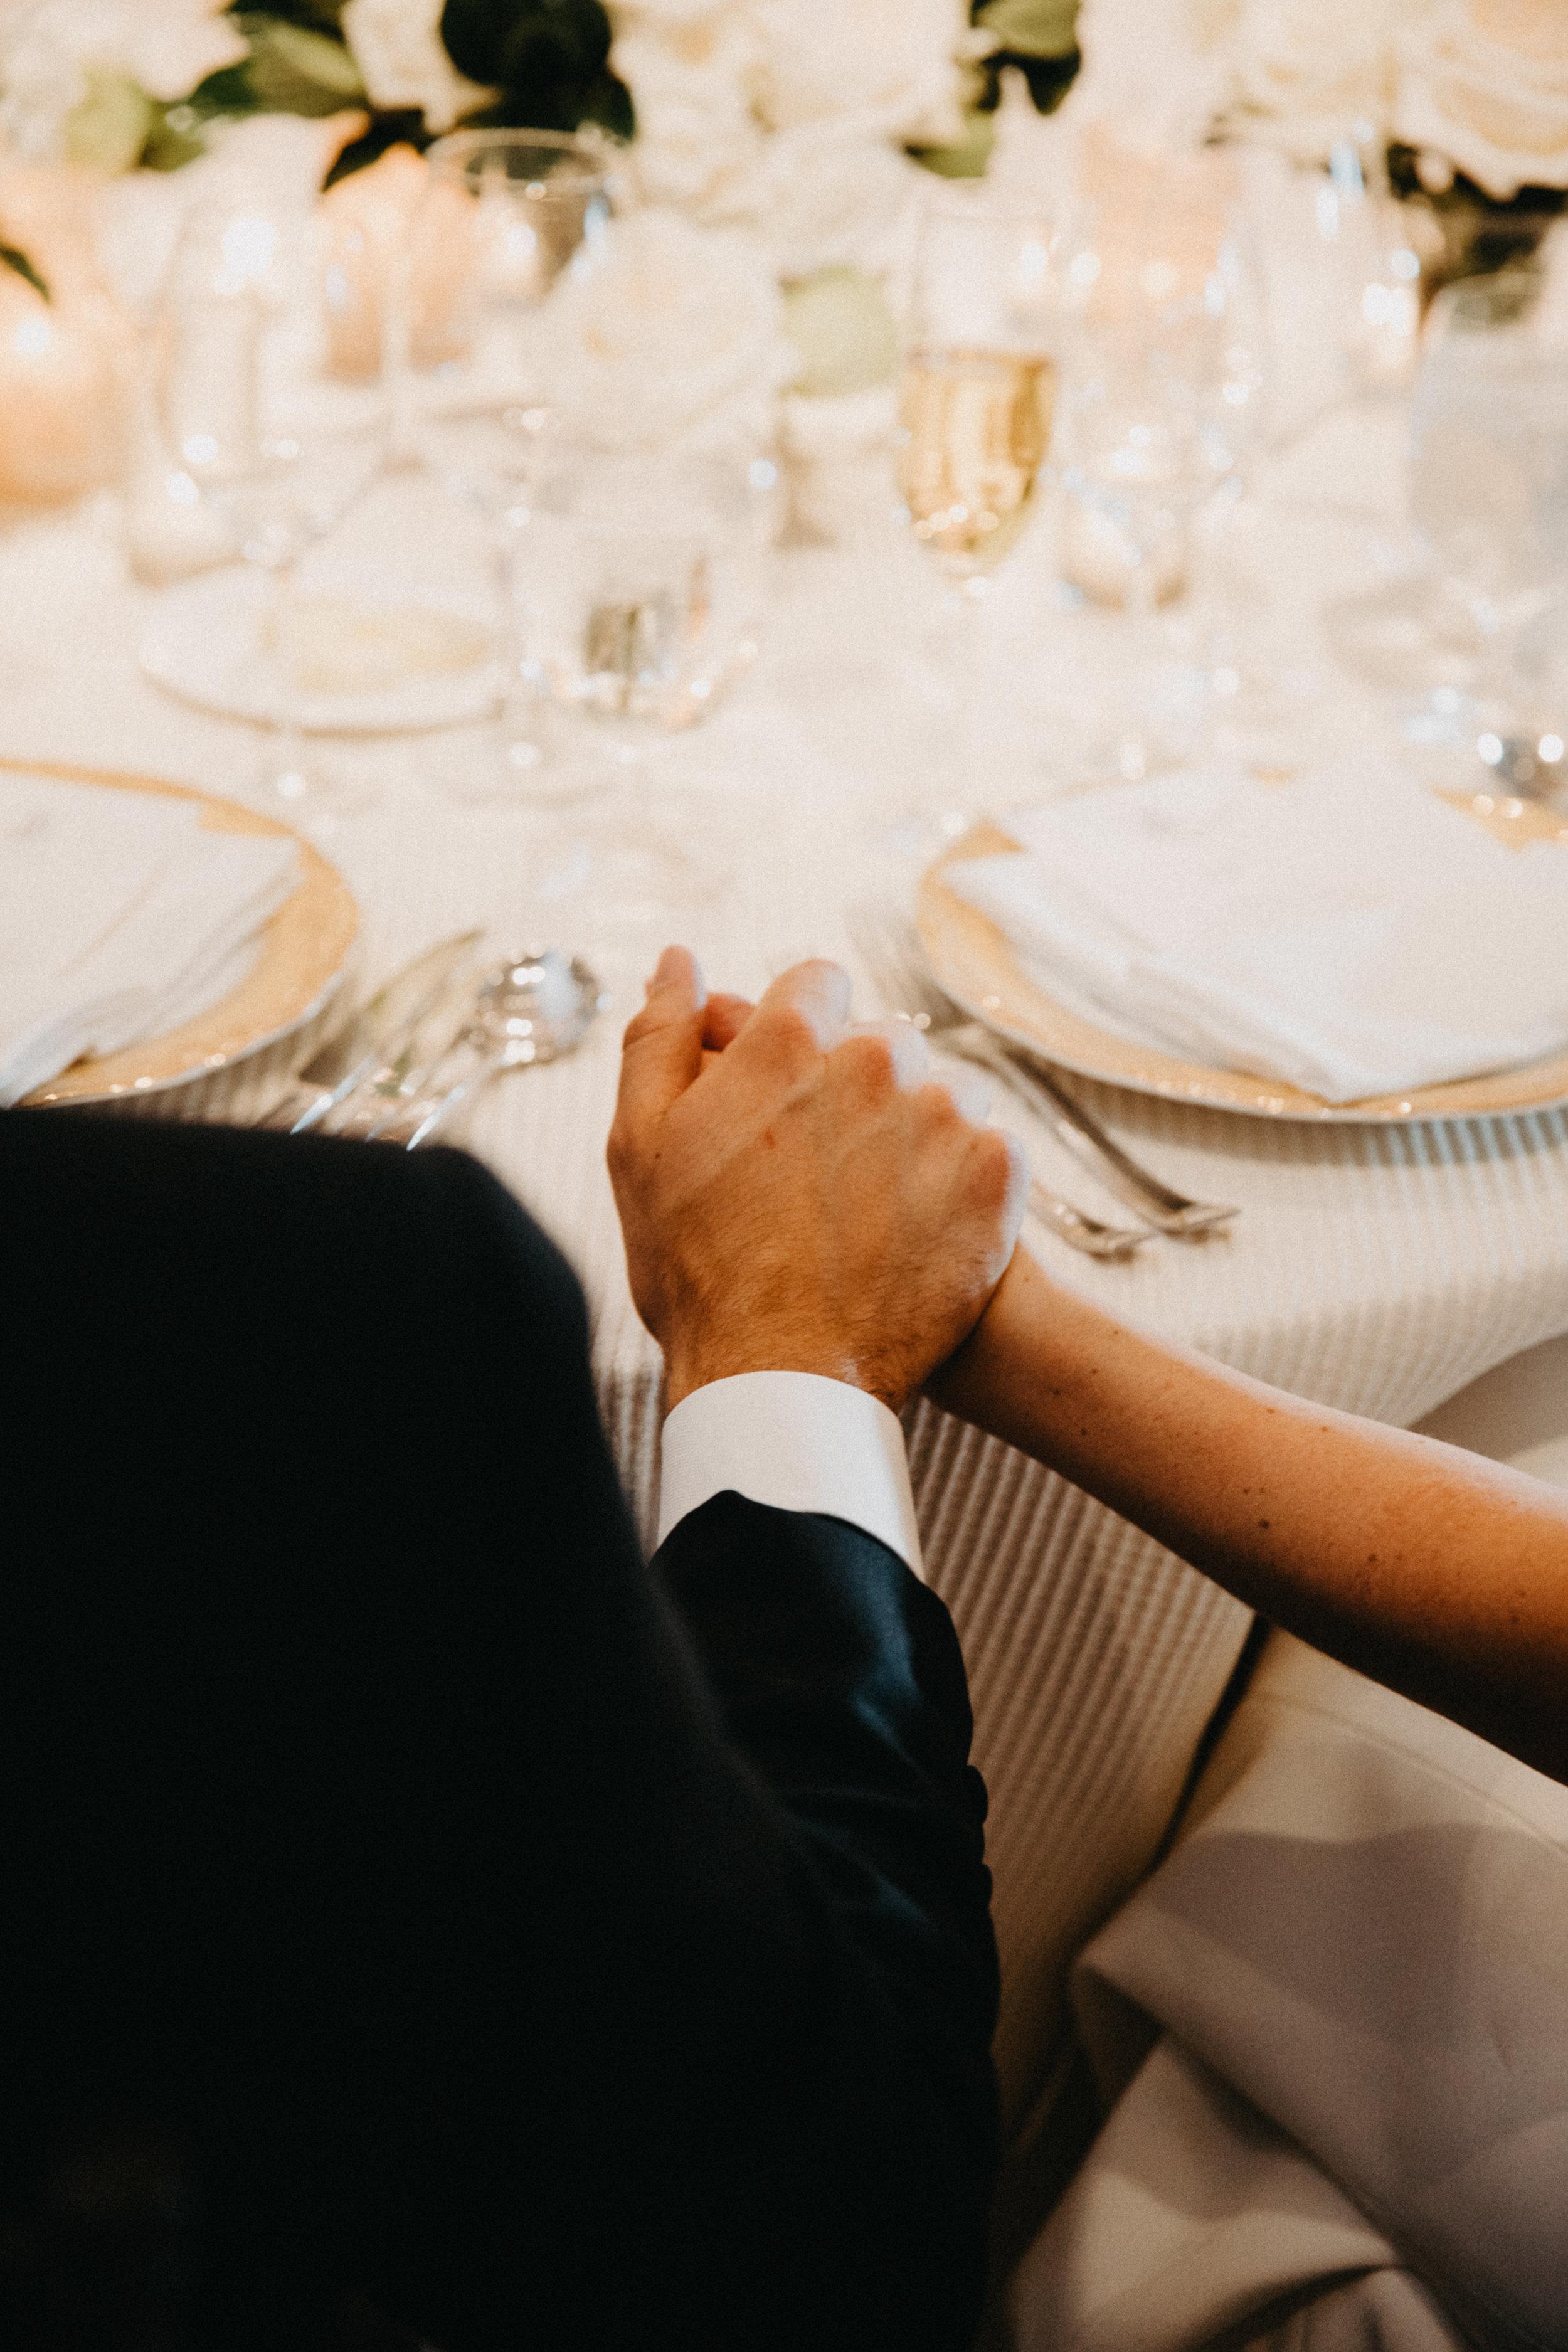 BOSTON PUBLIC GARDEN WEDDING, GARDEN WEDDING, BOSTON WEDDING PLANNER, NICOLE SIMERAL, FOUR SEASONS WEDDING, CLASSIC, TIMELESS, WEDDING WEDDING PLANNER, DESTINATION WEDDING, BRIDE AND GROOM, I DO